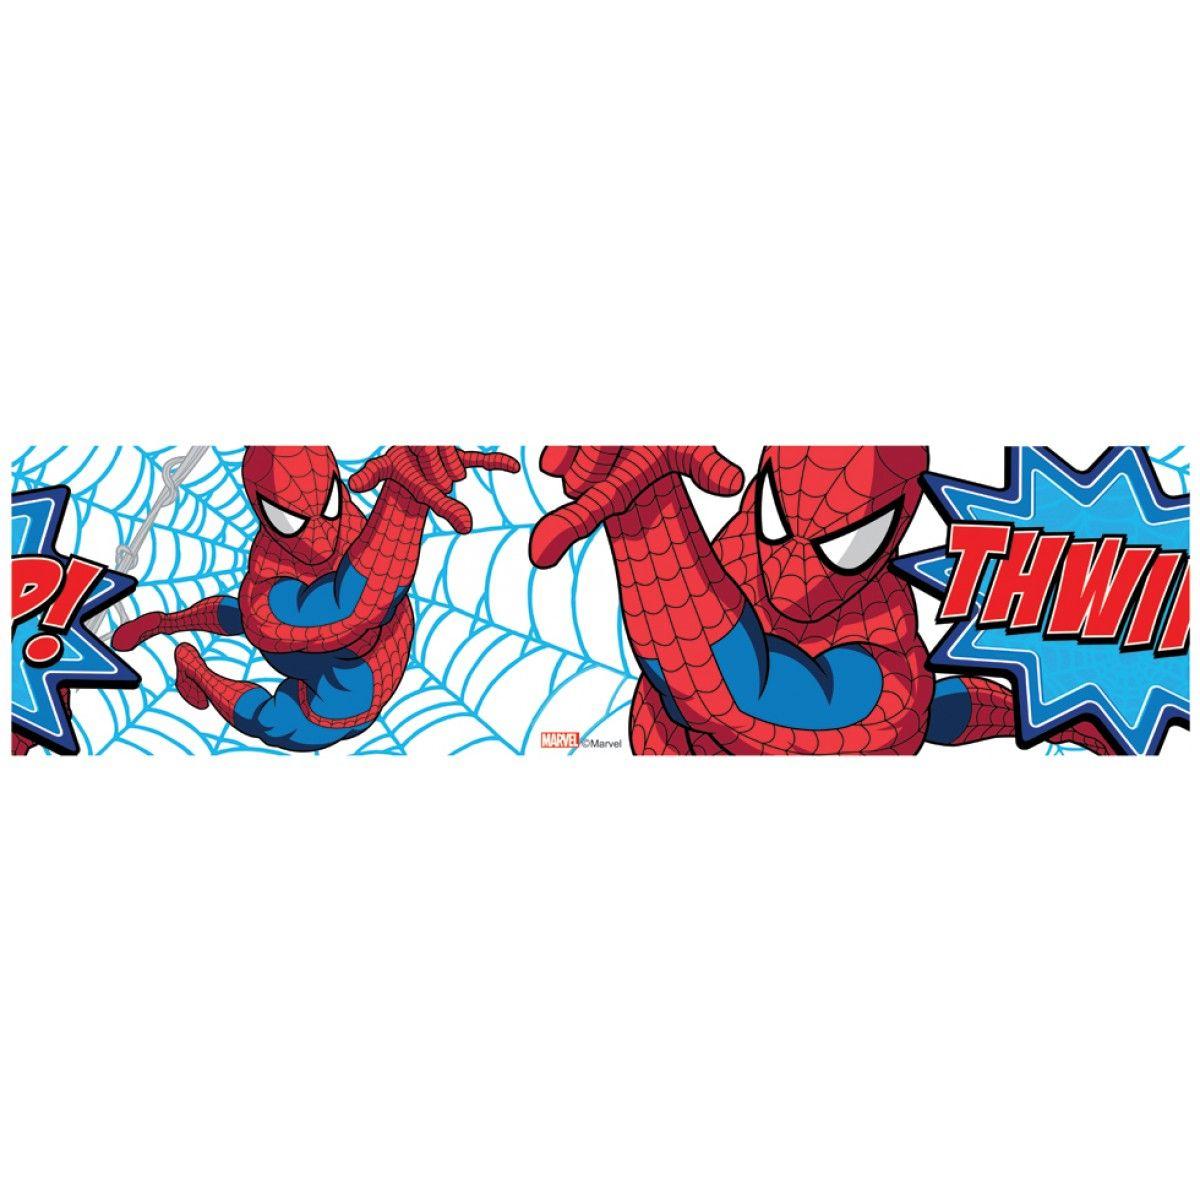 Spiderman Thwip Self Adhesive Wallpaper Border Wallpaper